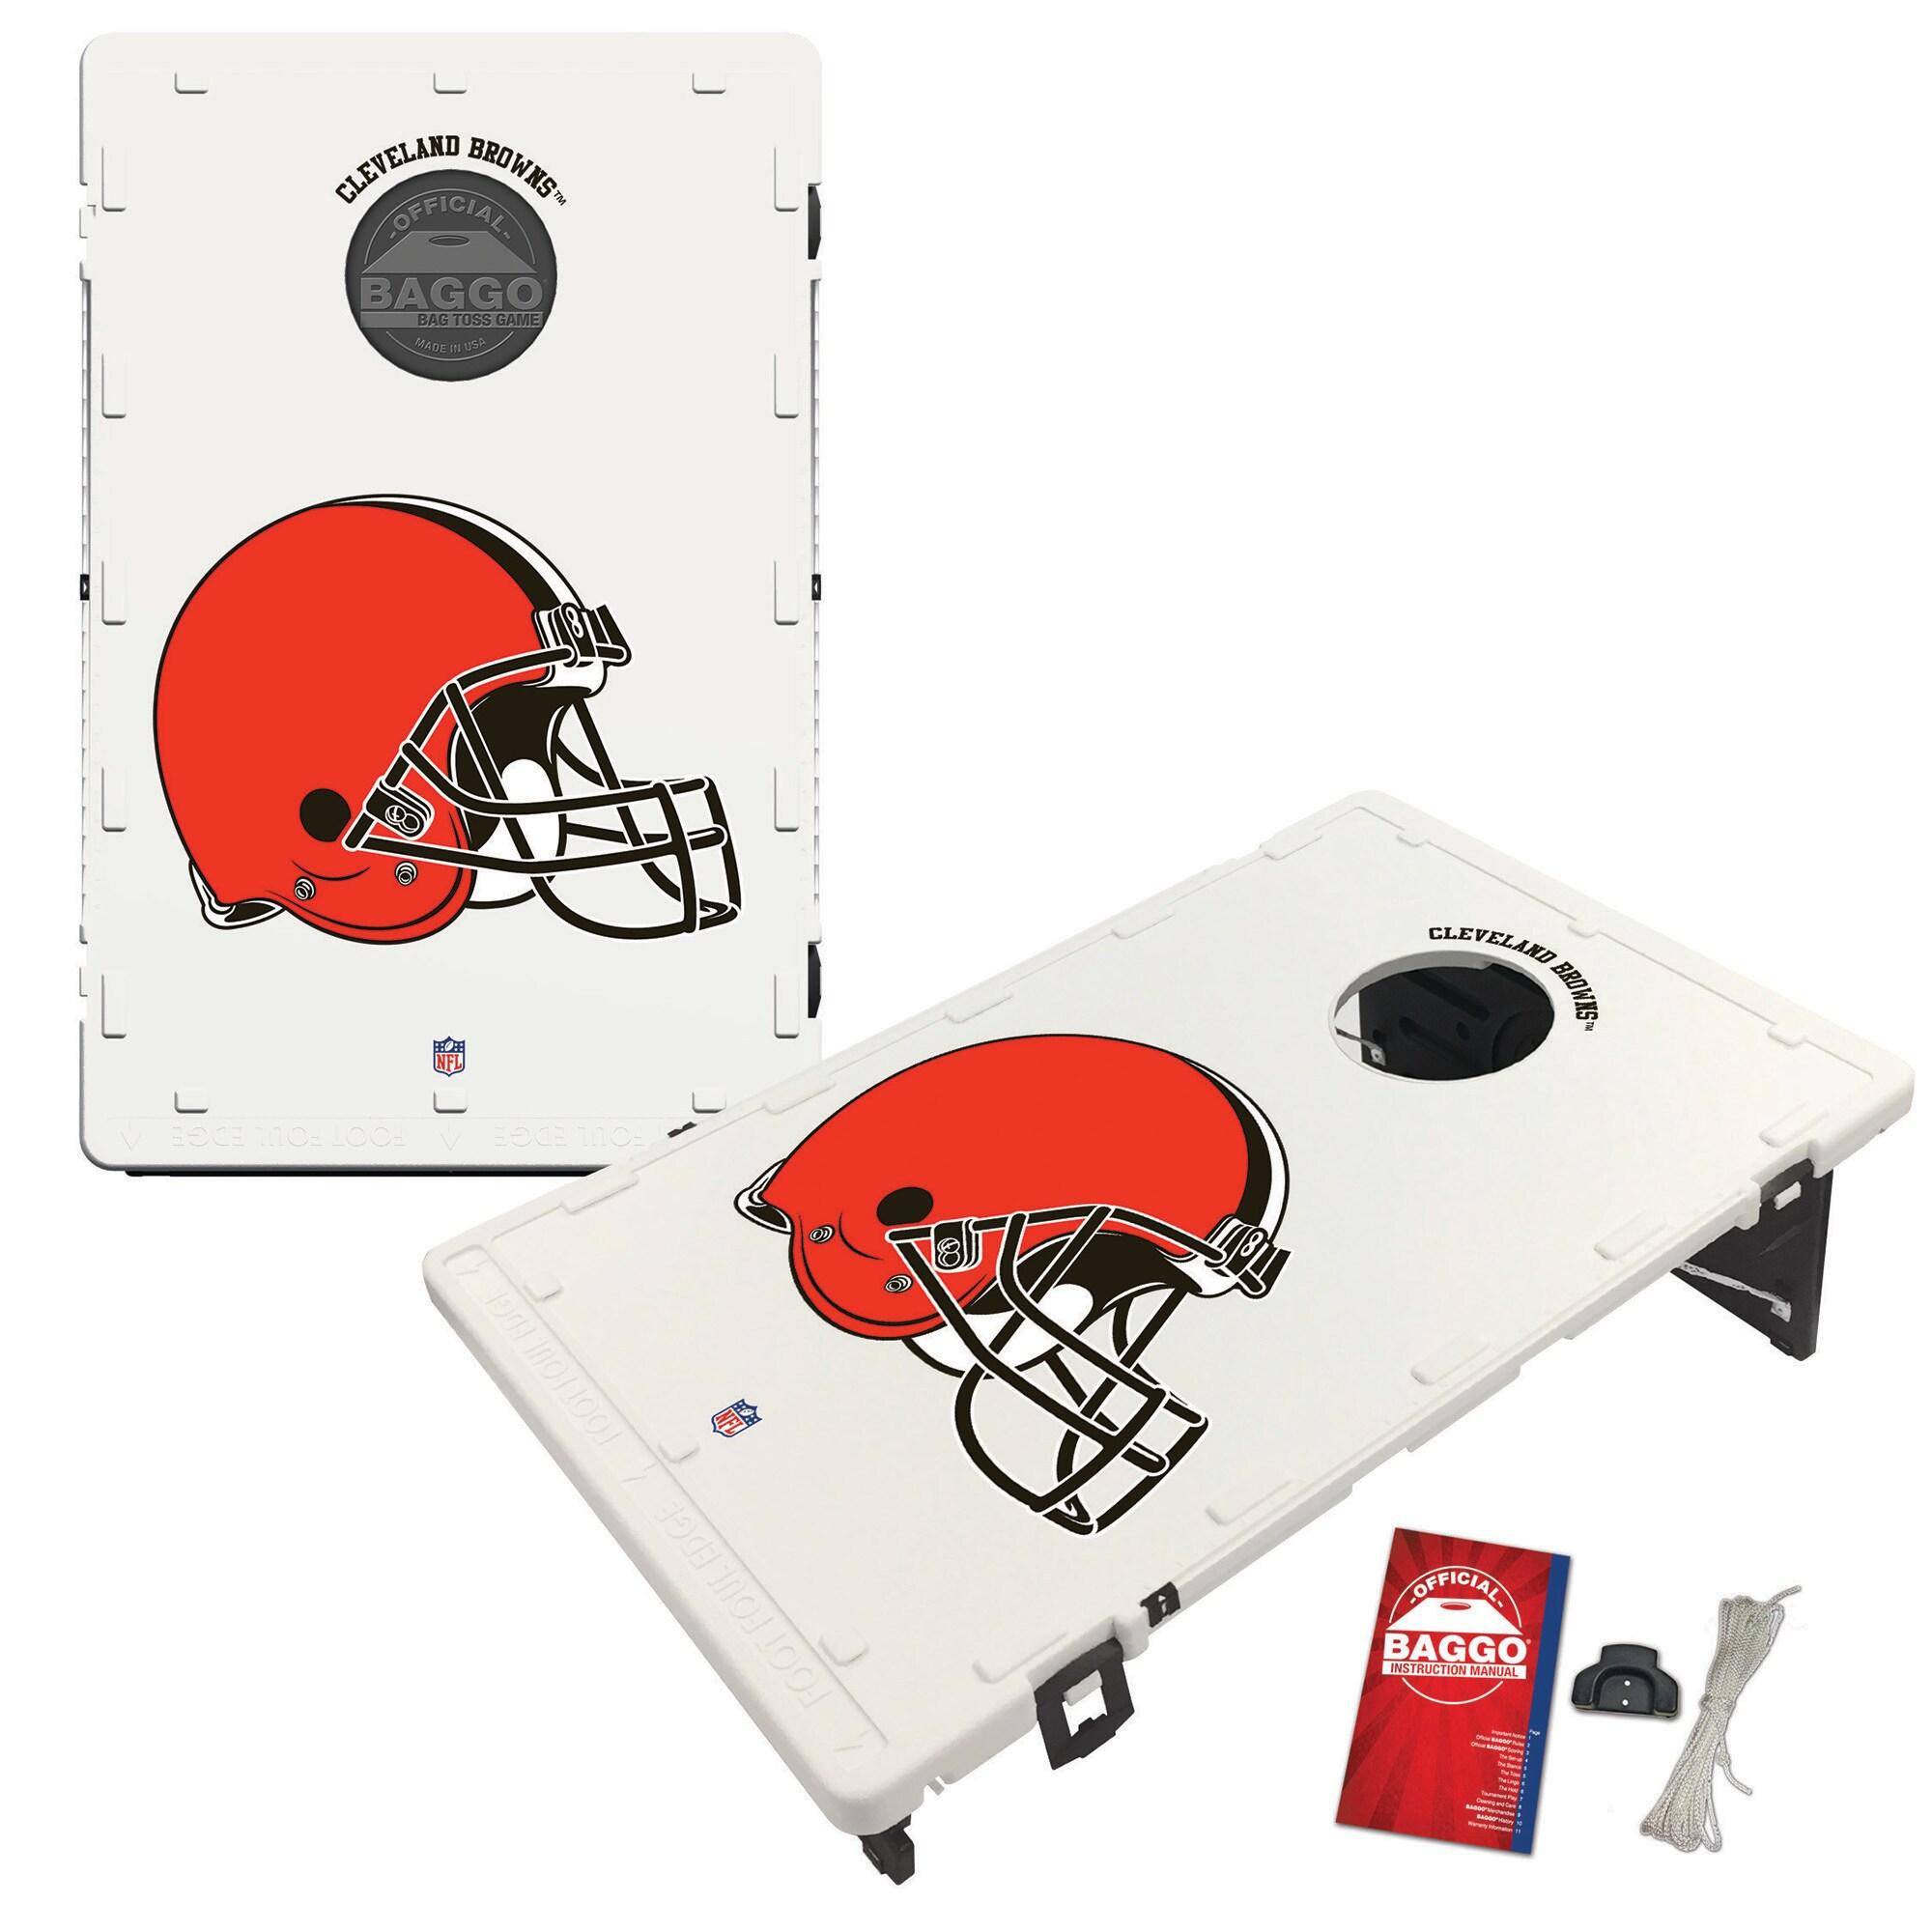 Cleveland Browns 2' x 3' Classic Design BAGGO Cornhole Board Tailgate Toss Set